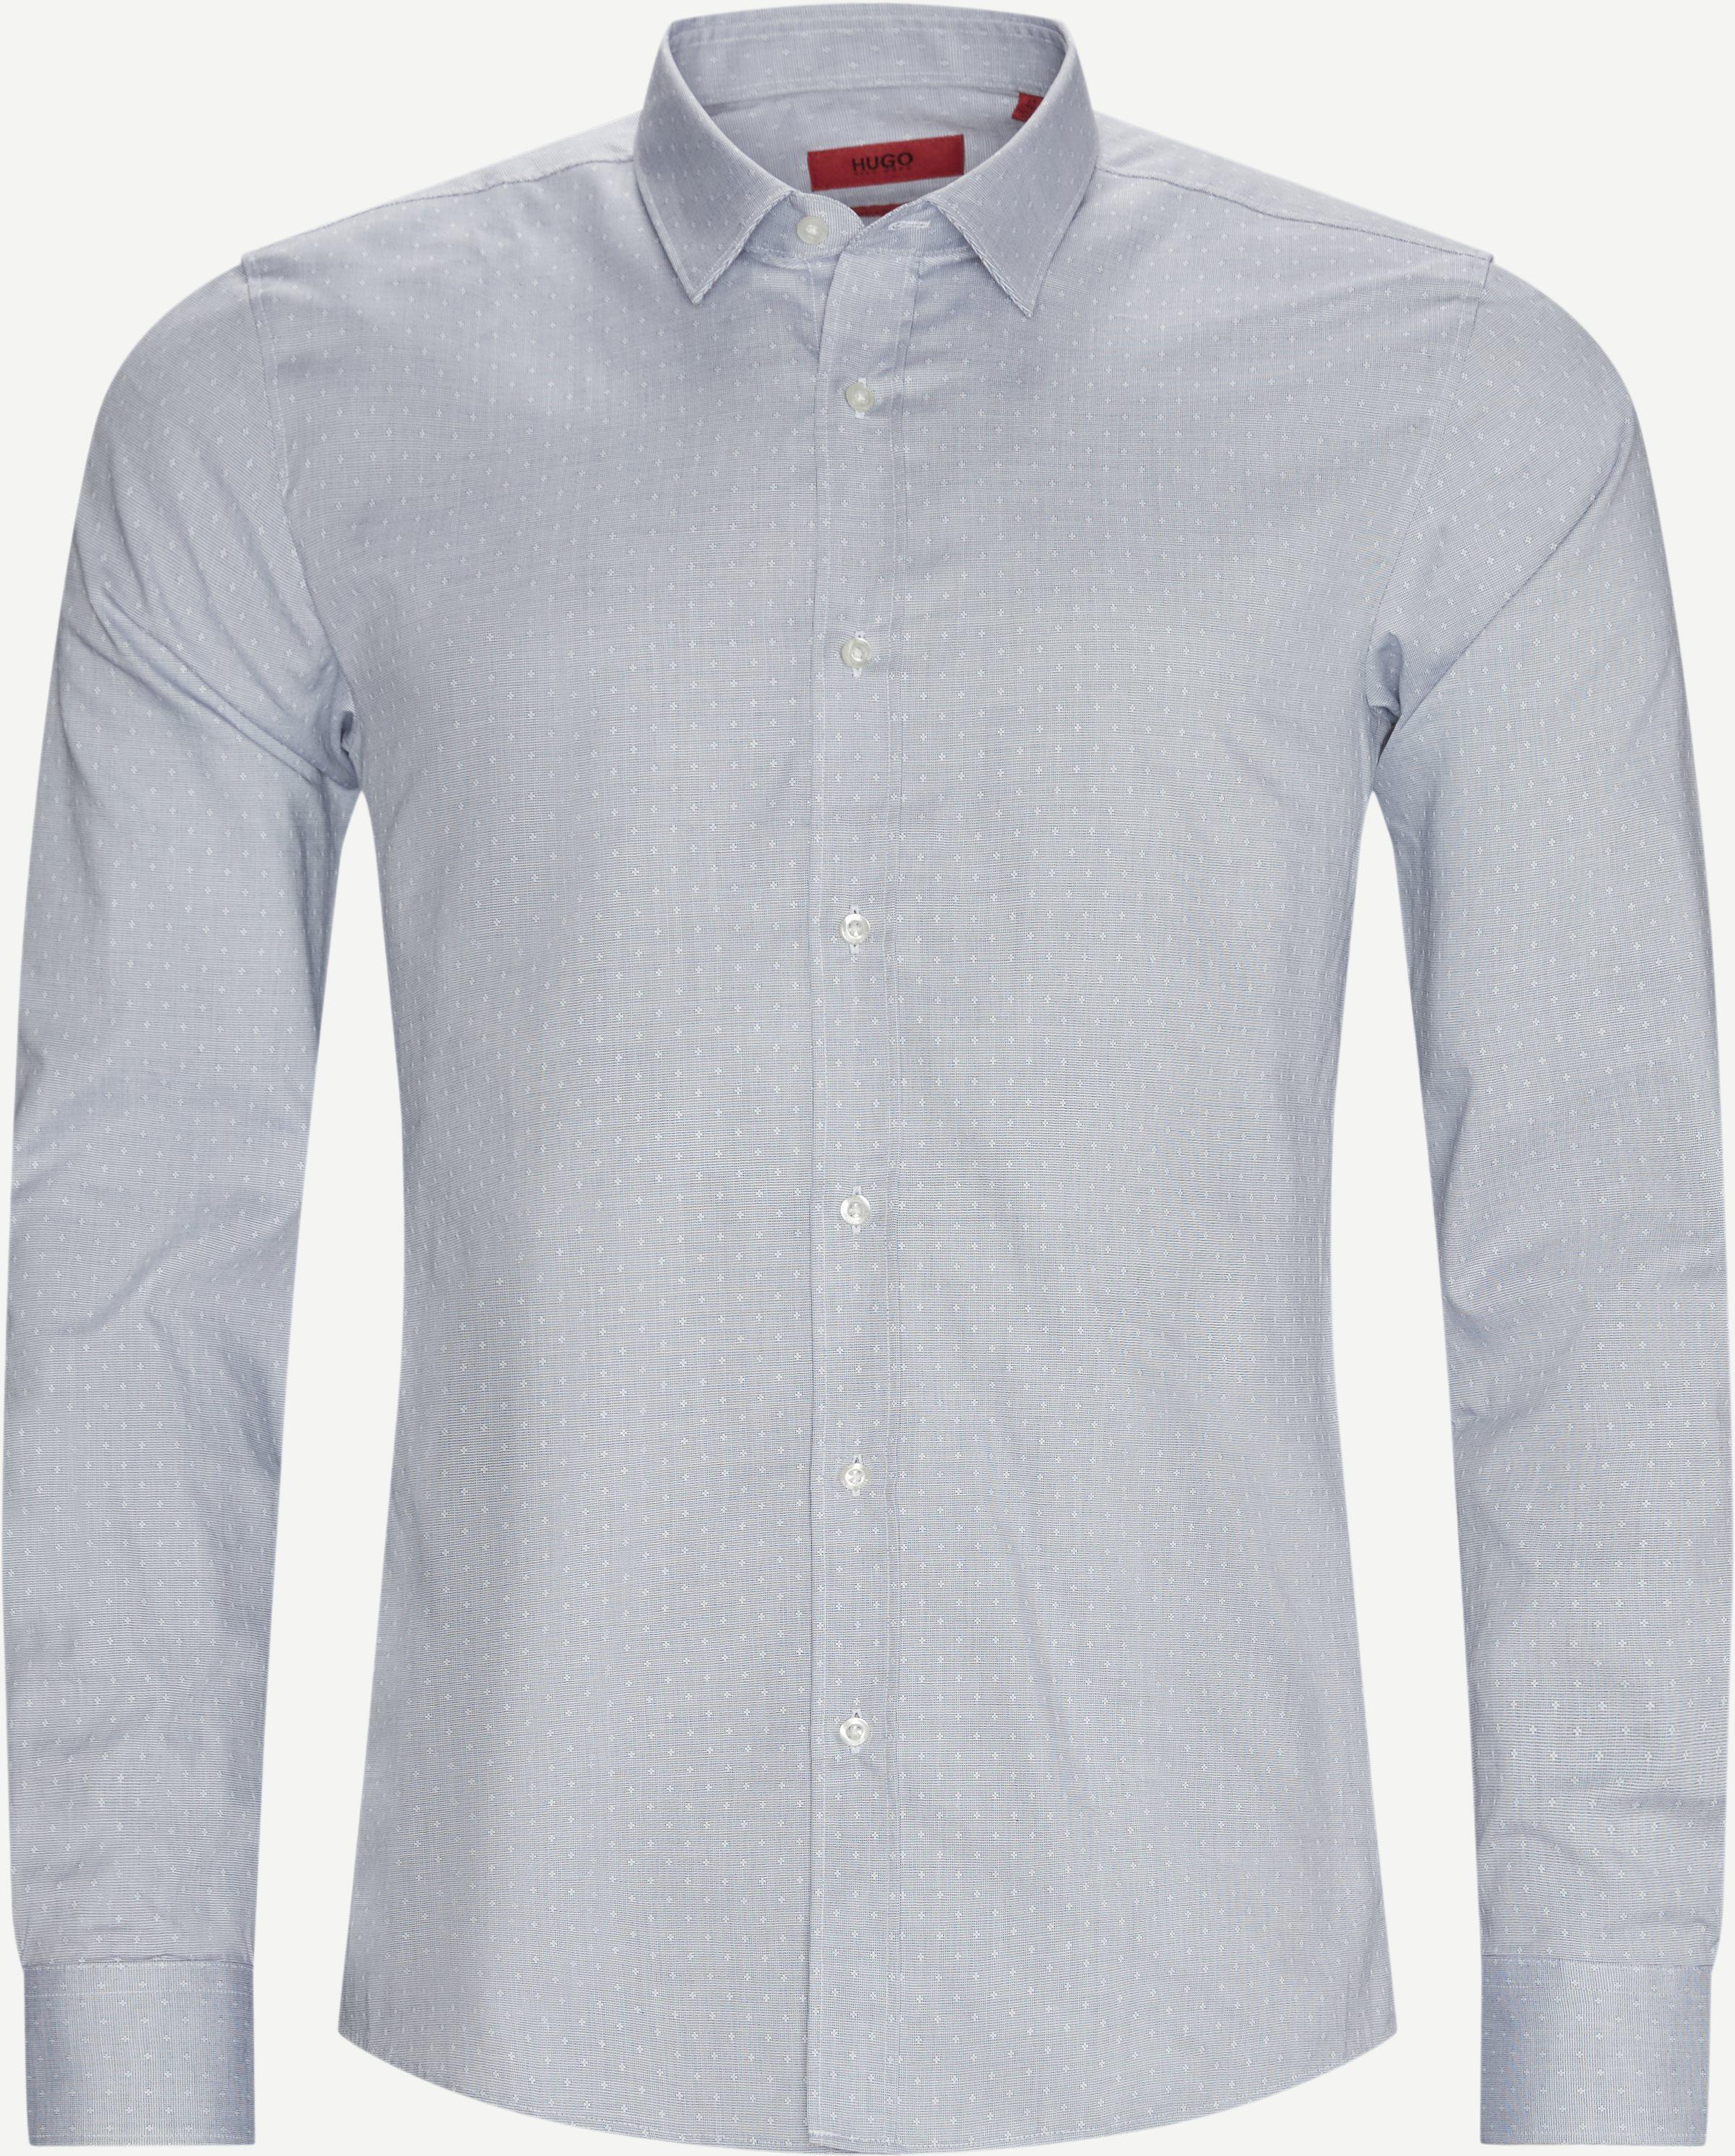 Elisha Shirt - Skjorter - Ekstra slim fit - Blå